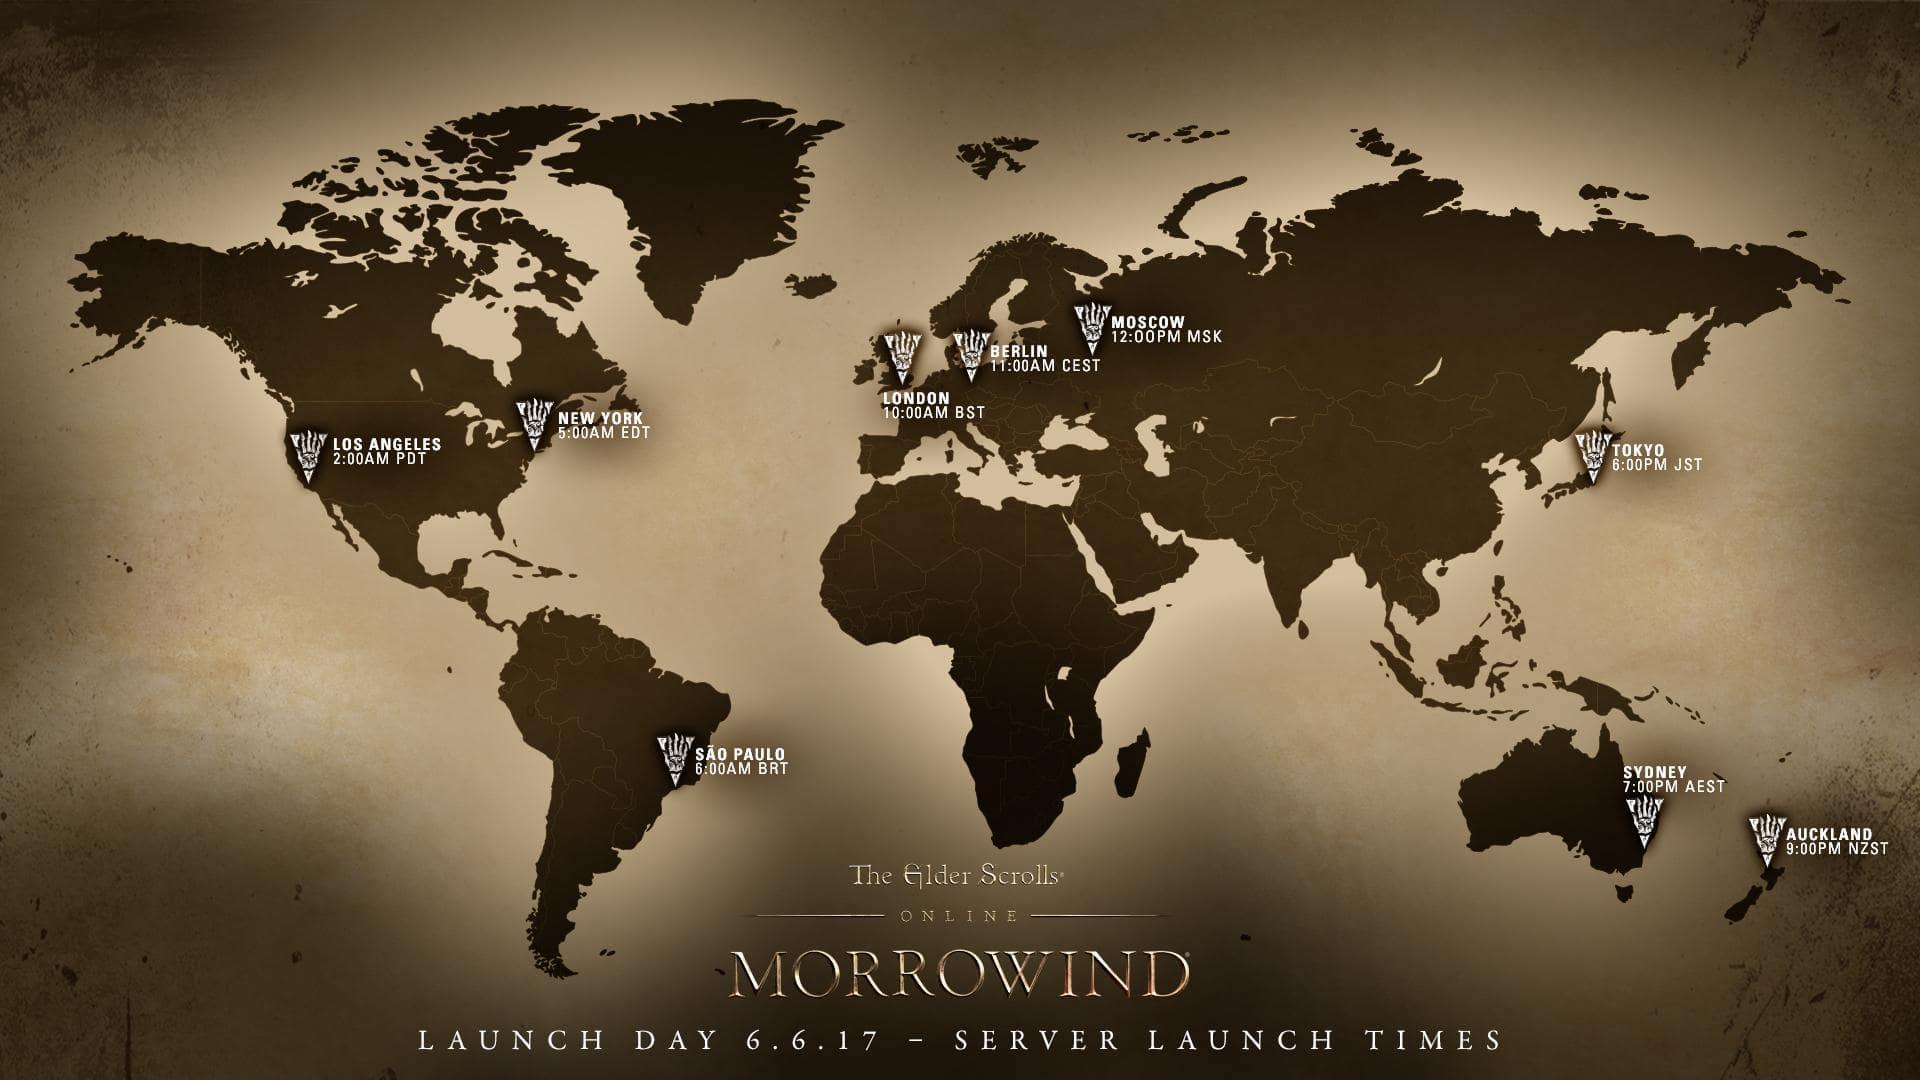 Launch Details for The Elder Scrolls Online Morrowind  The Elder